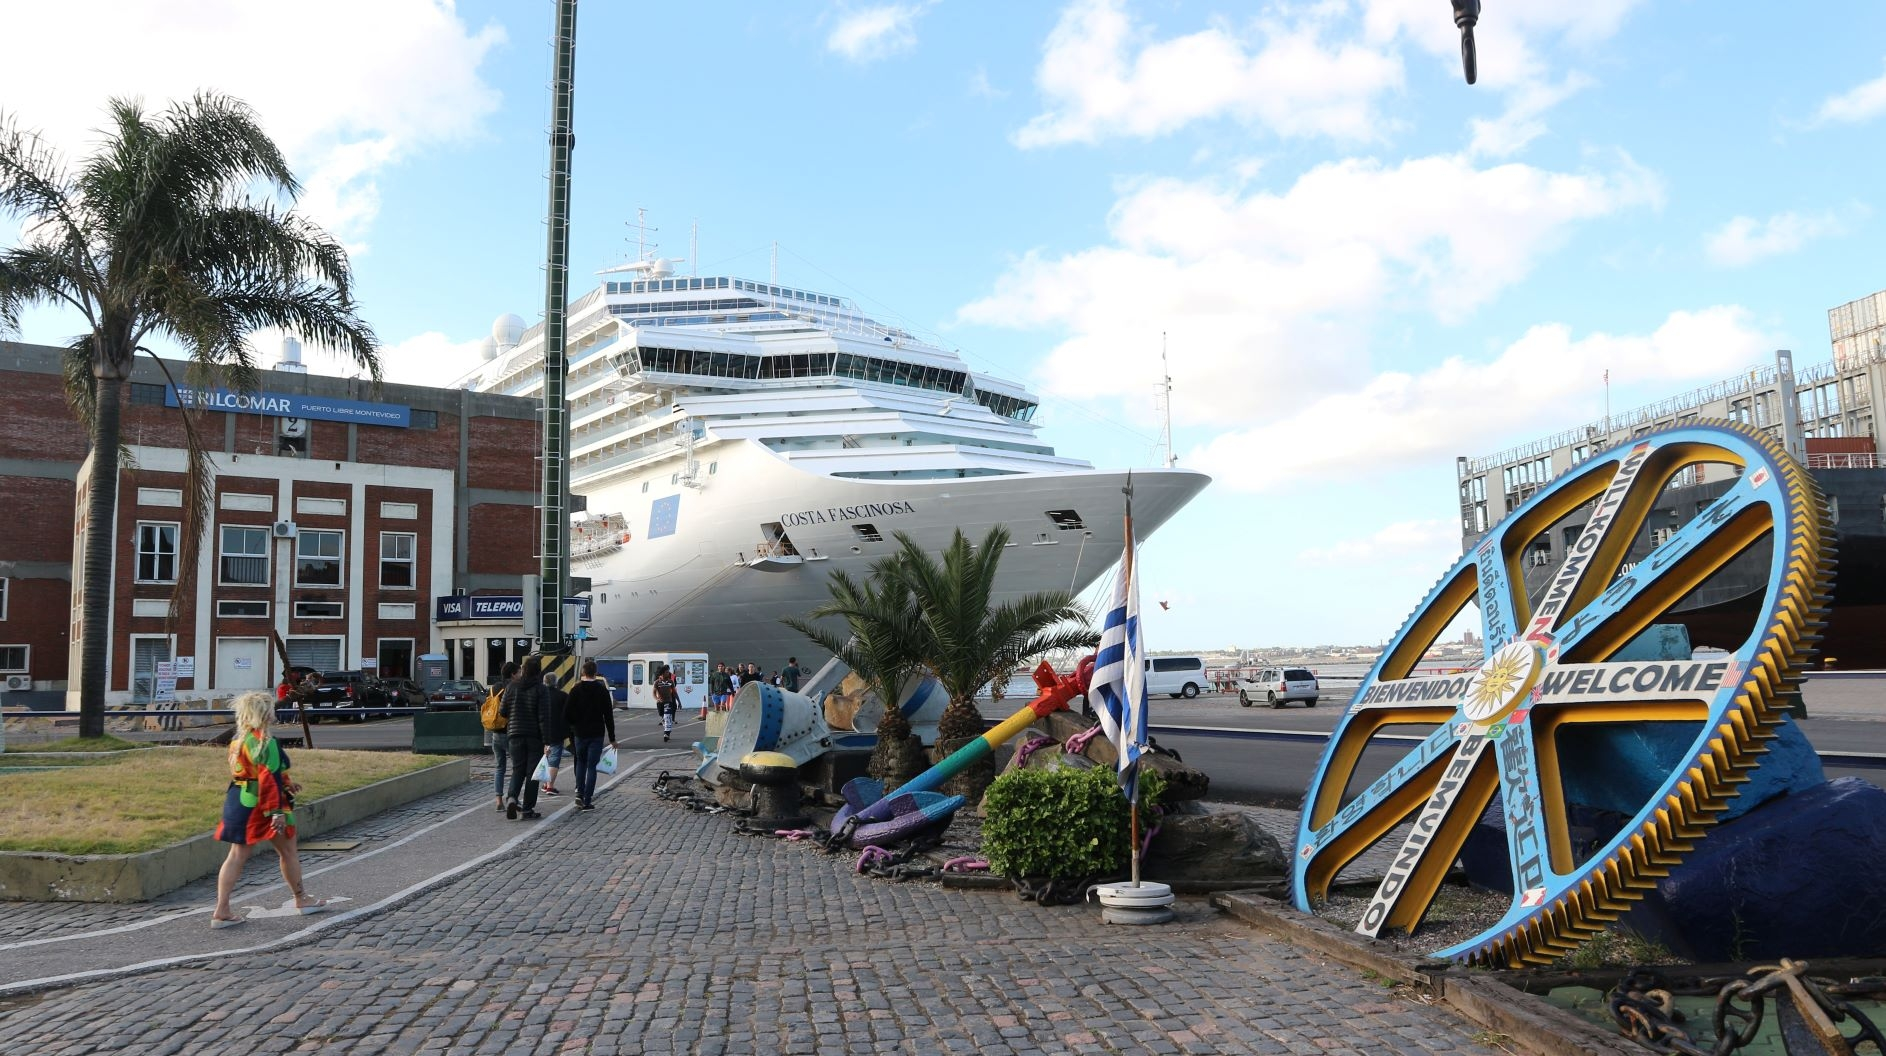 Costa zarpará desde Montevideo en diciembre 2019